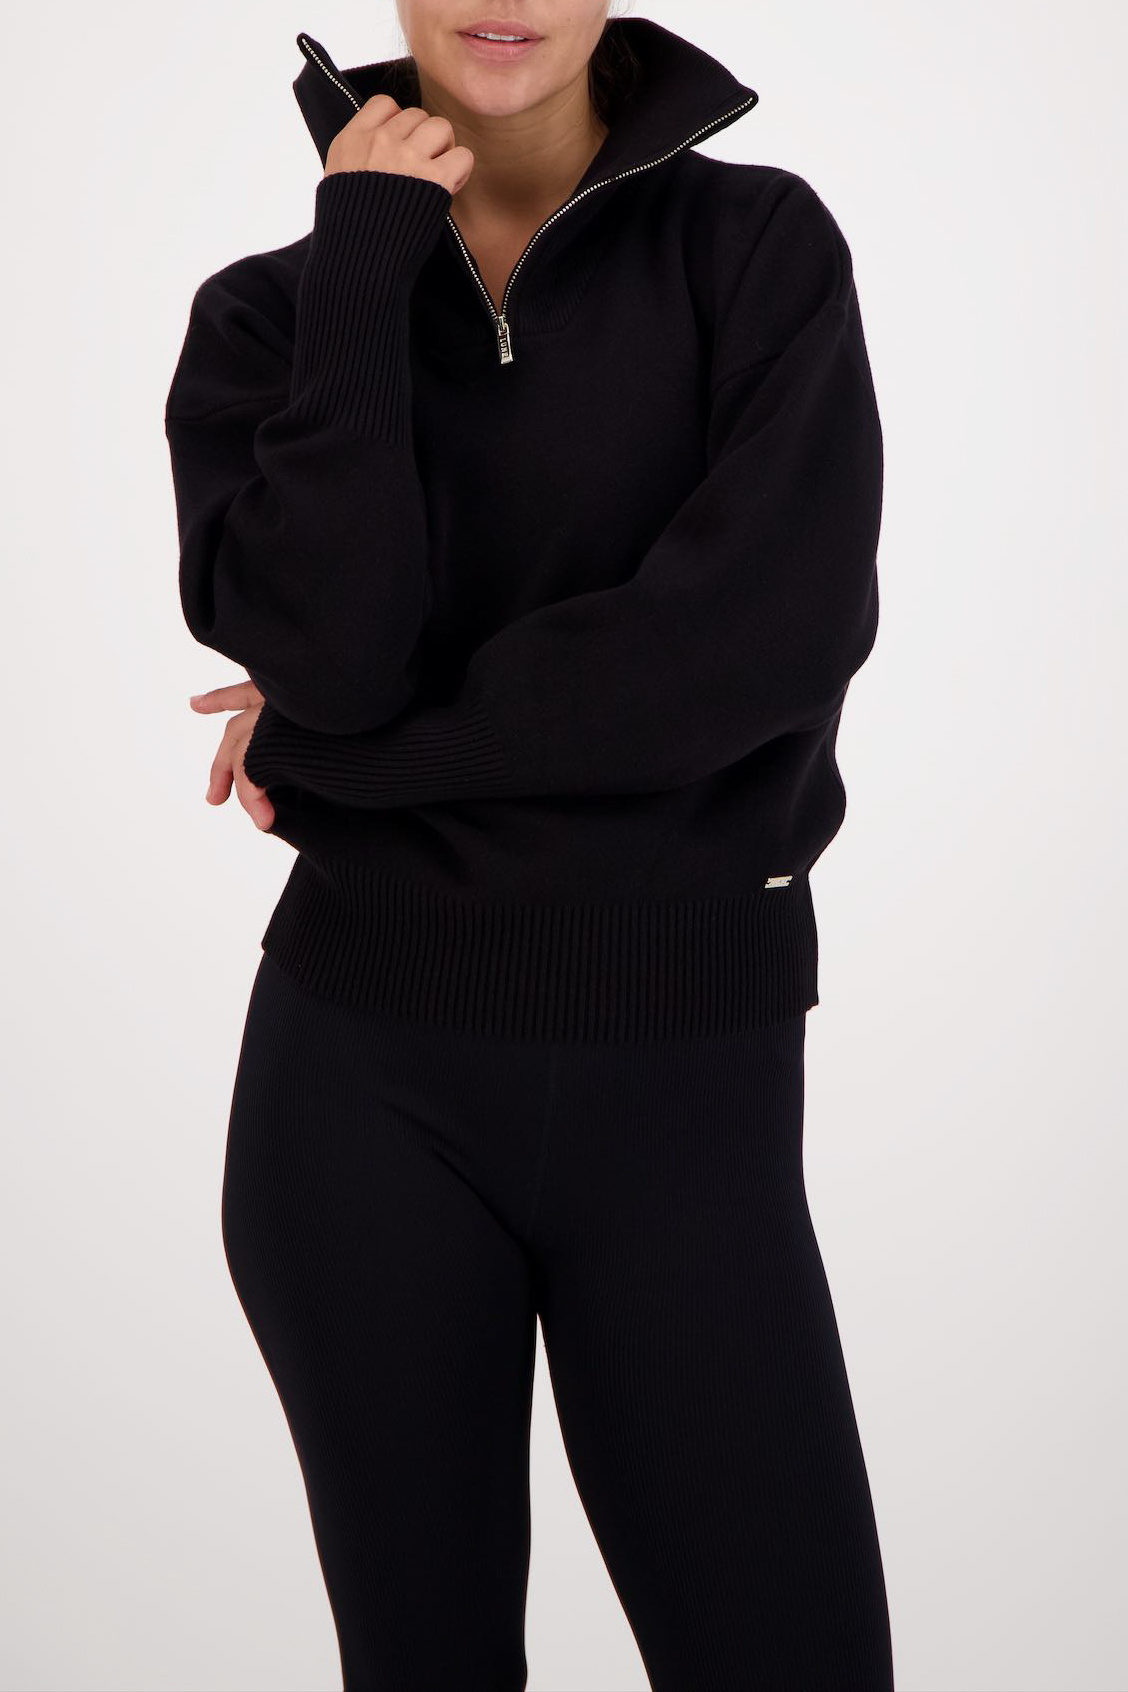 Olly Half-Zip Knit Sweater - Black-1